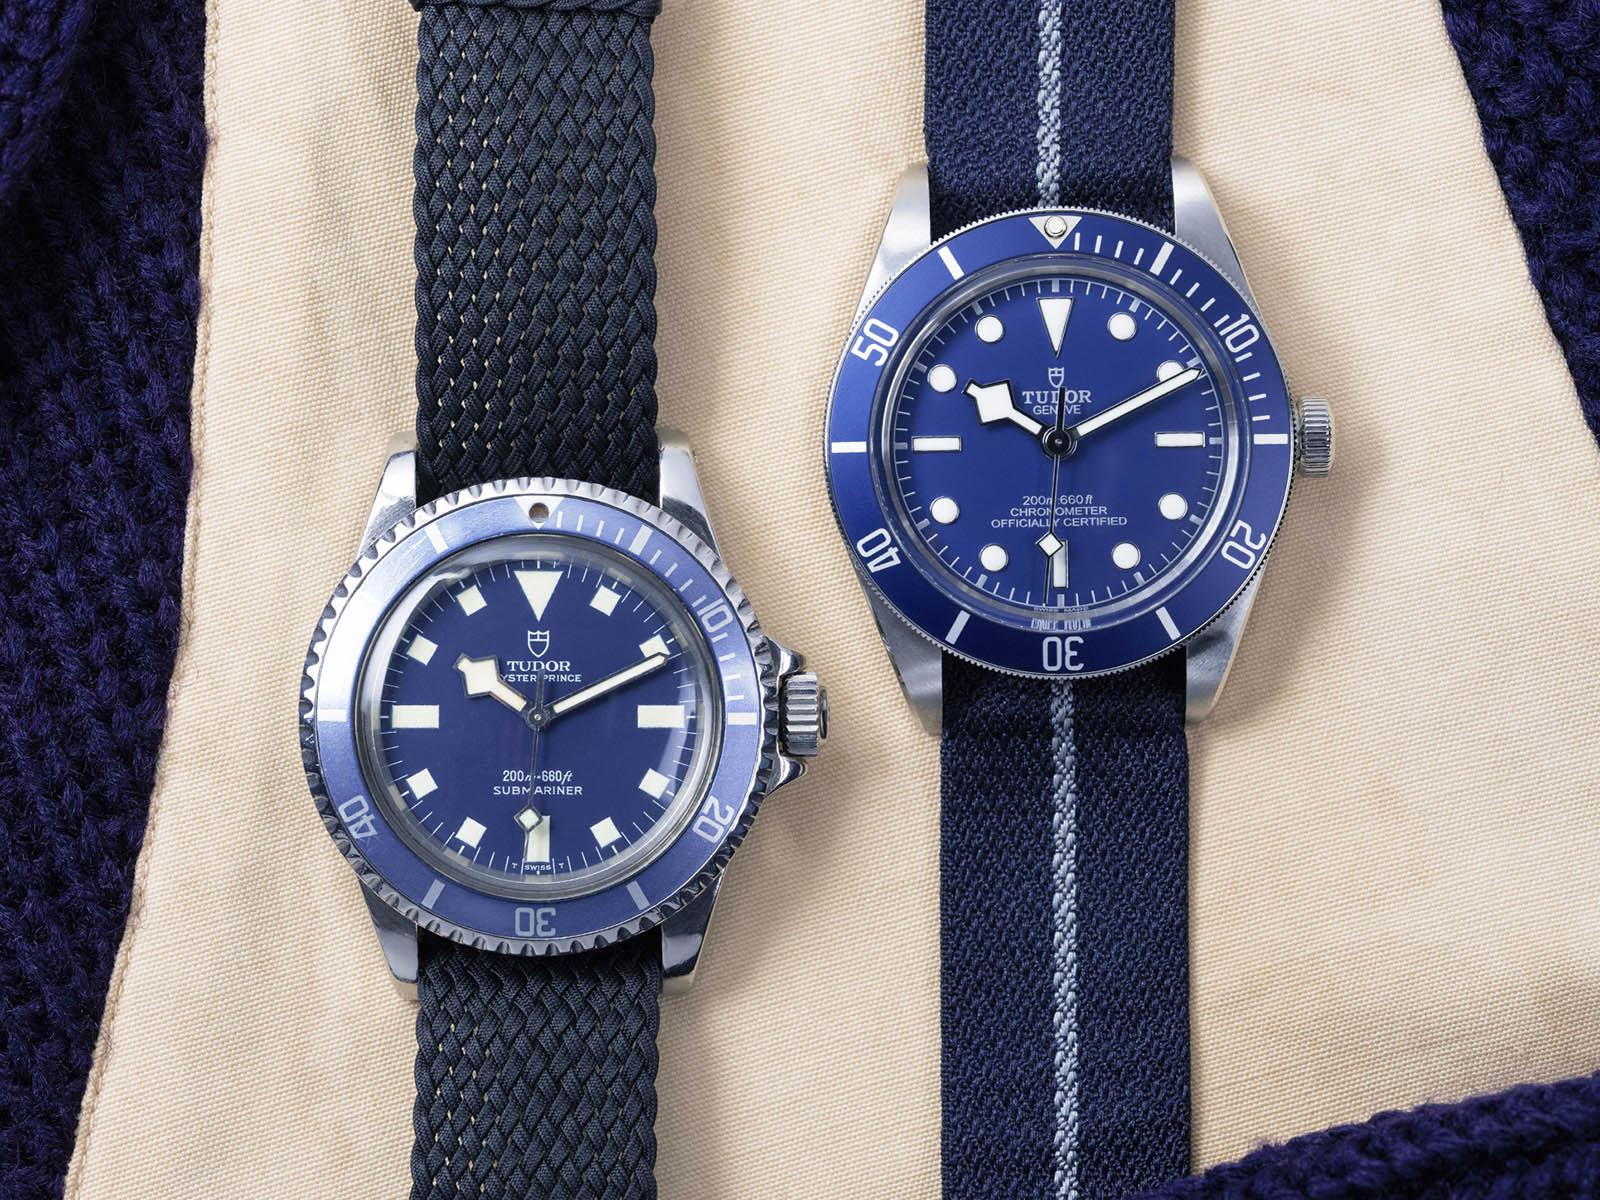 79030b-tudor-black-bay-fifty-eight-navy-blue-5.jpg